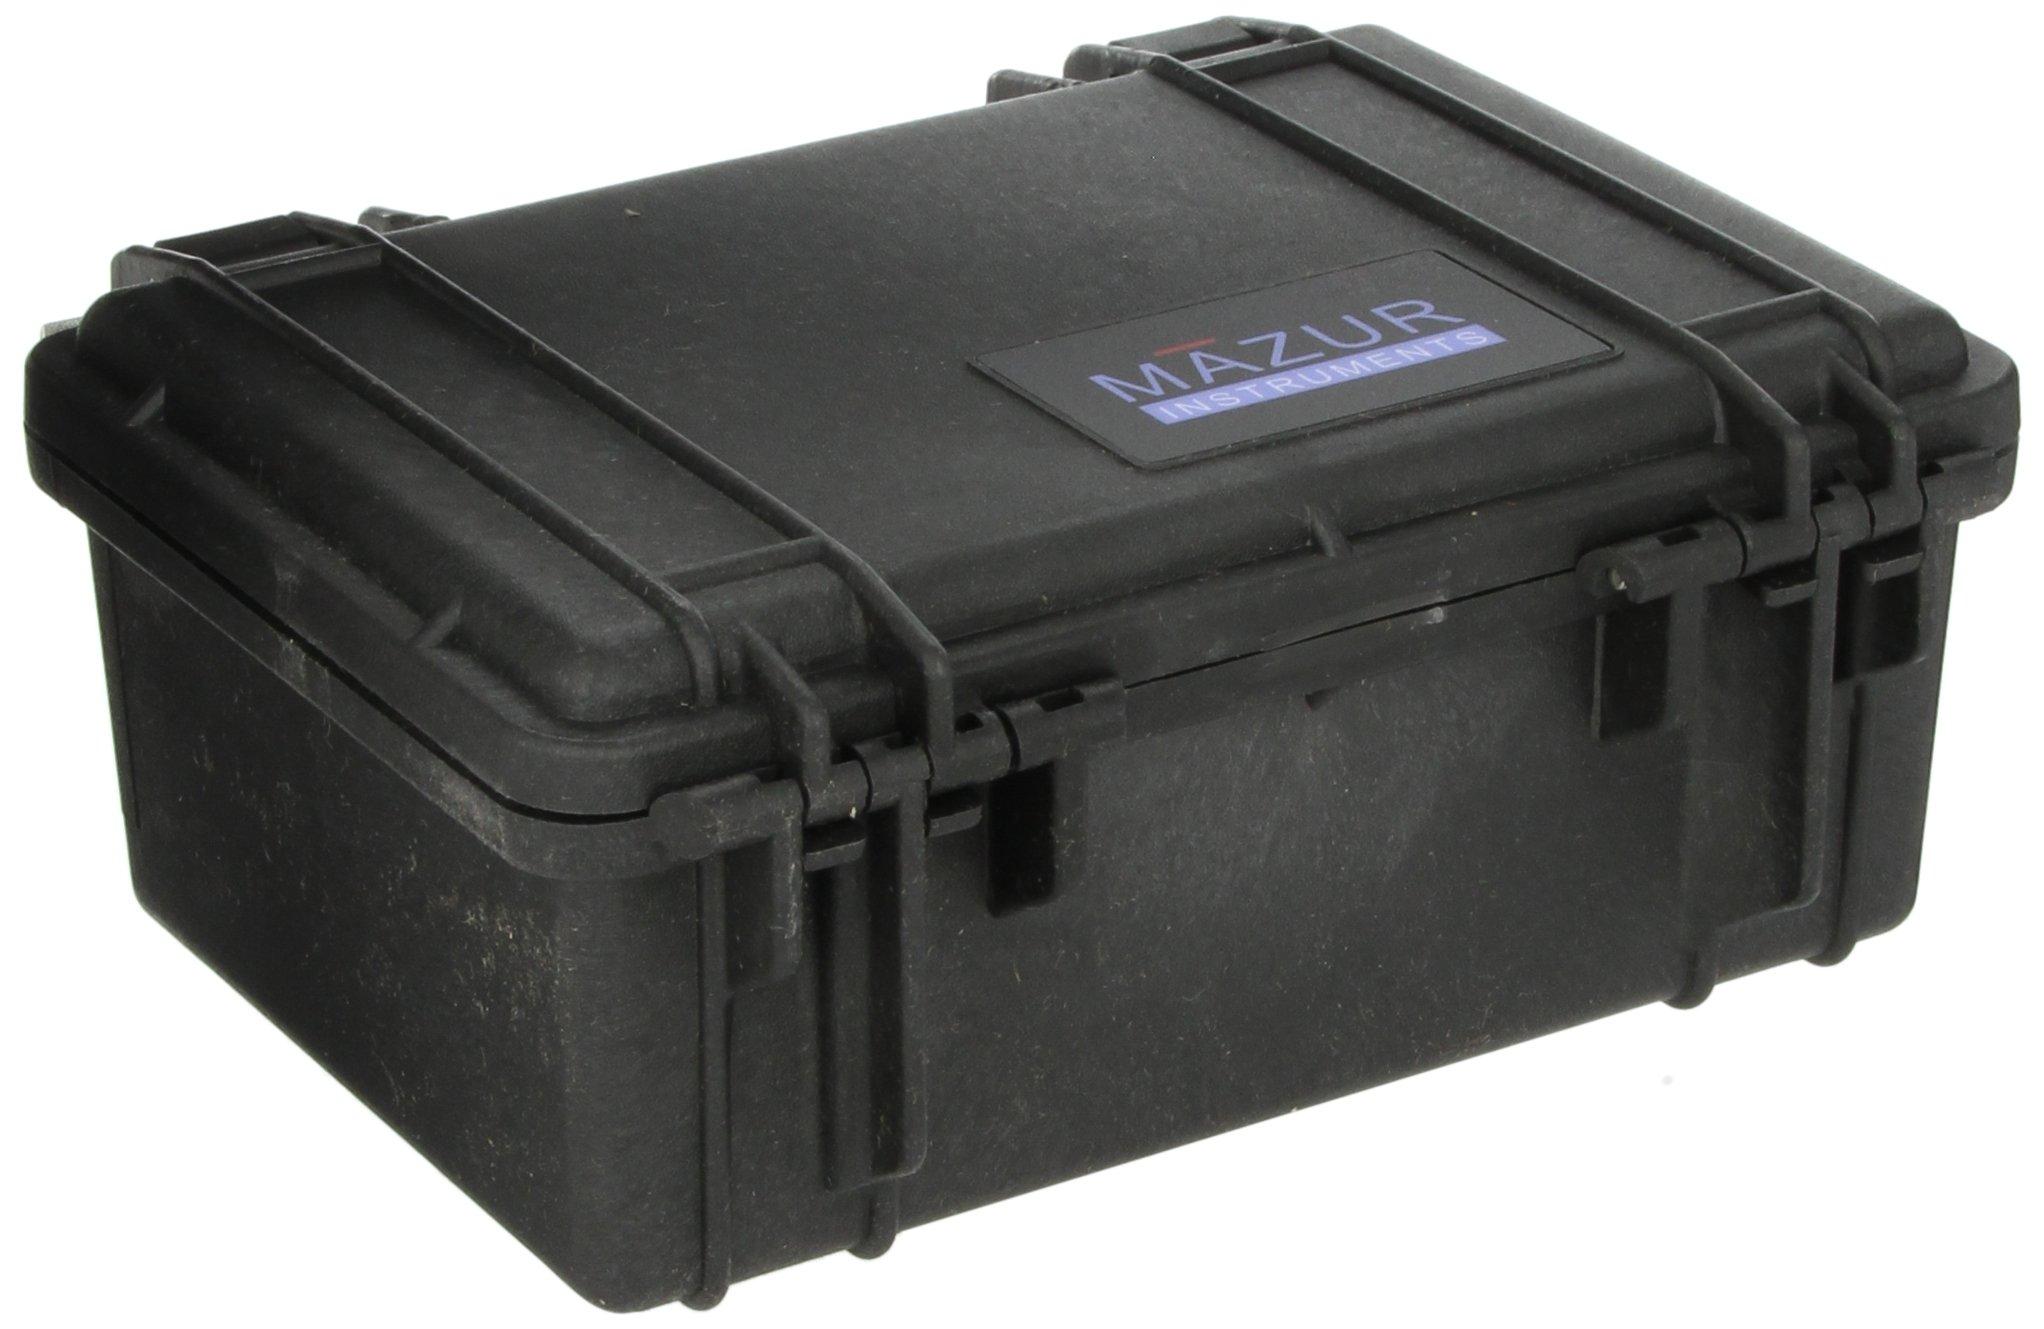 Mazur Instruments PRM-HC-BK Pelican PRM Hard Field Case, 7-1/4'' Length x 4-3/4'' Width, Black